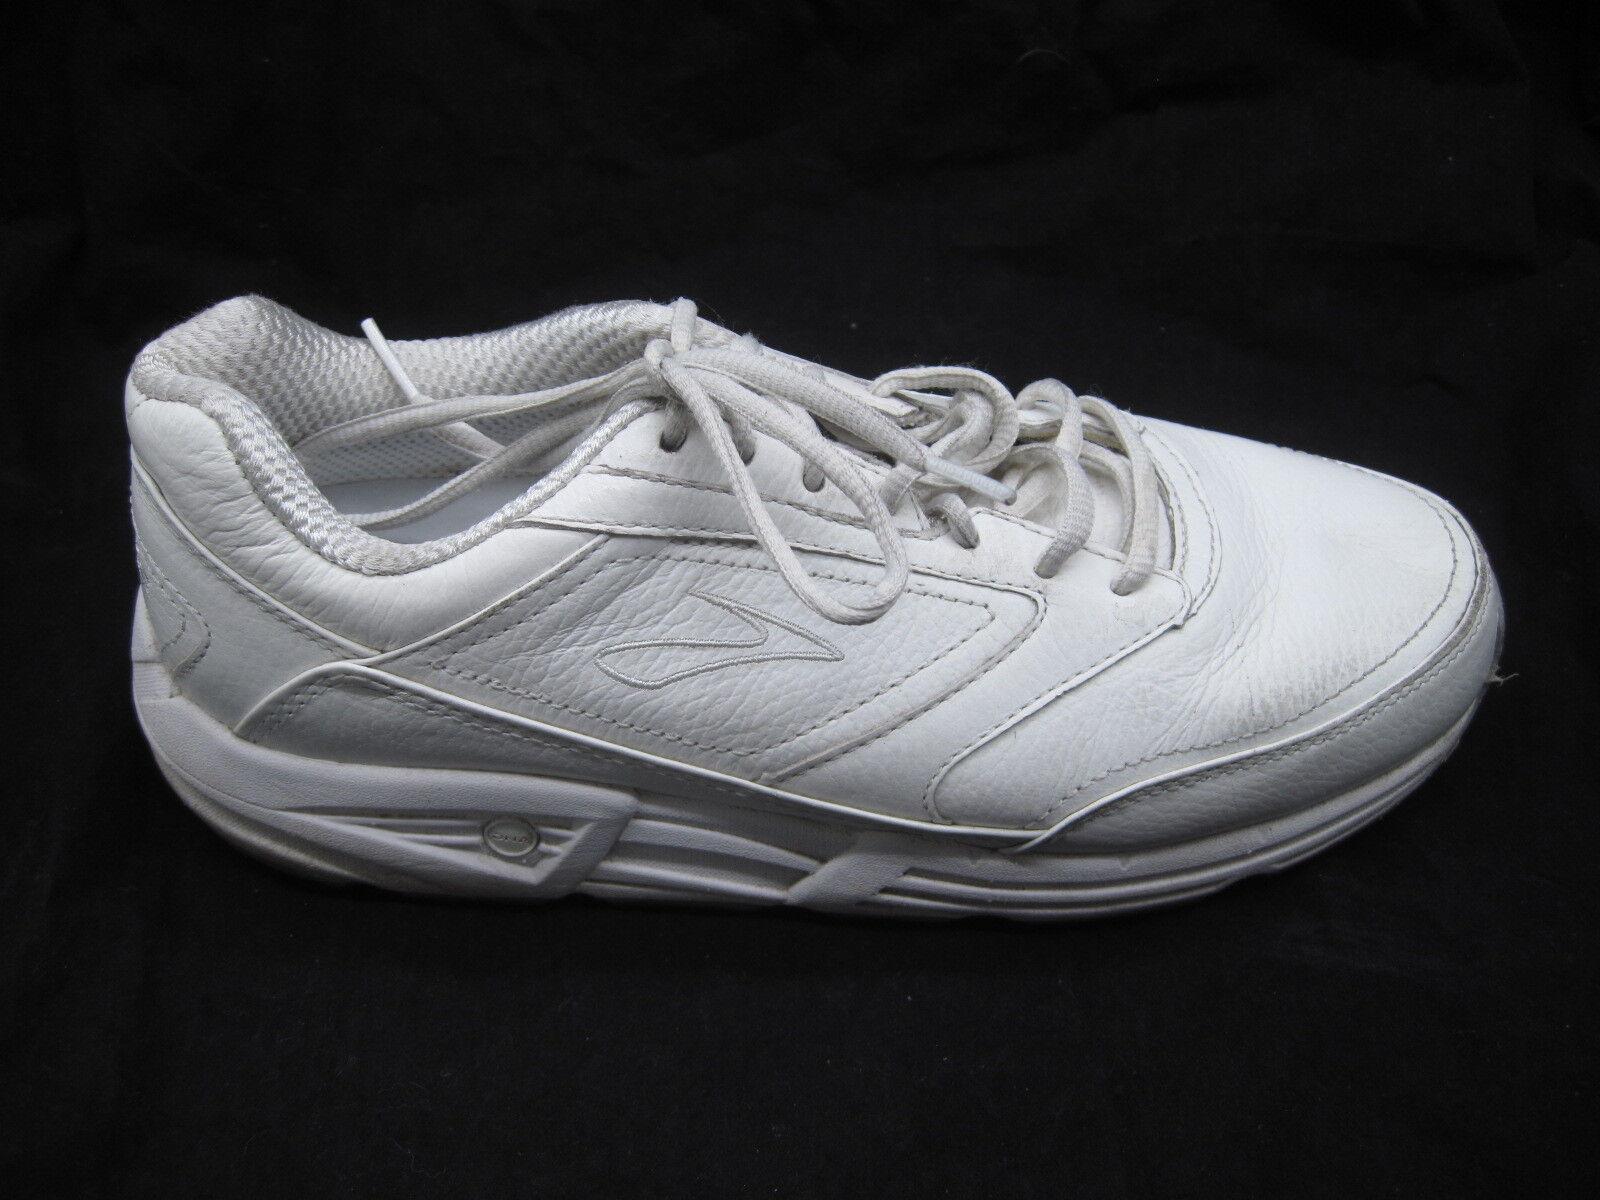 Brooks Addiction Walker bianca walking Uomo athletic tennis tennis tennis scarpe 10D 2017 86ed98